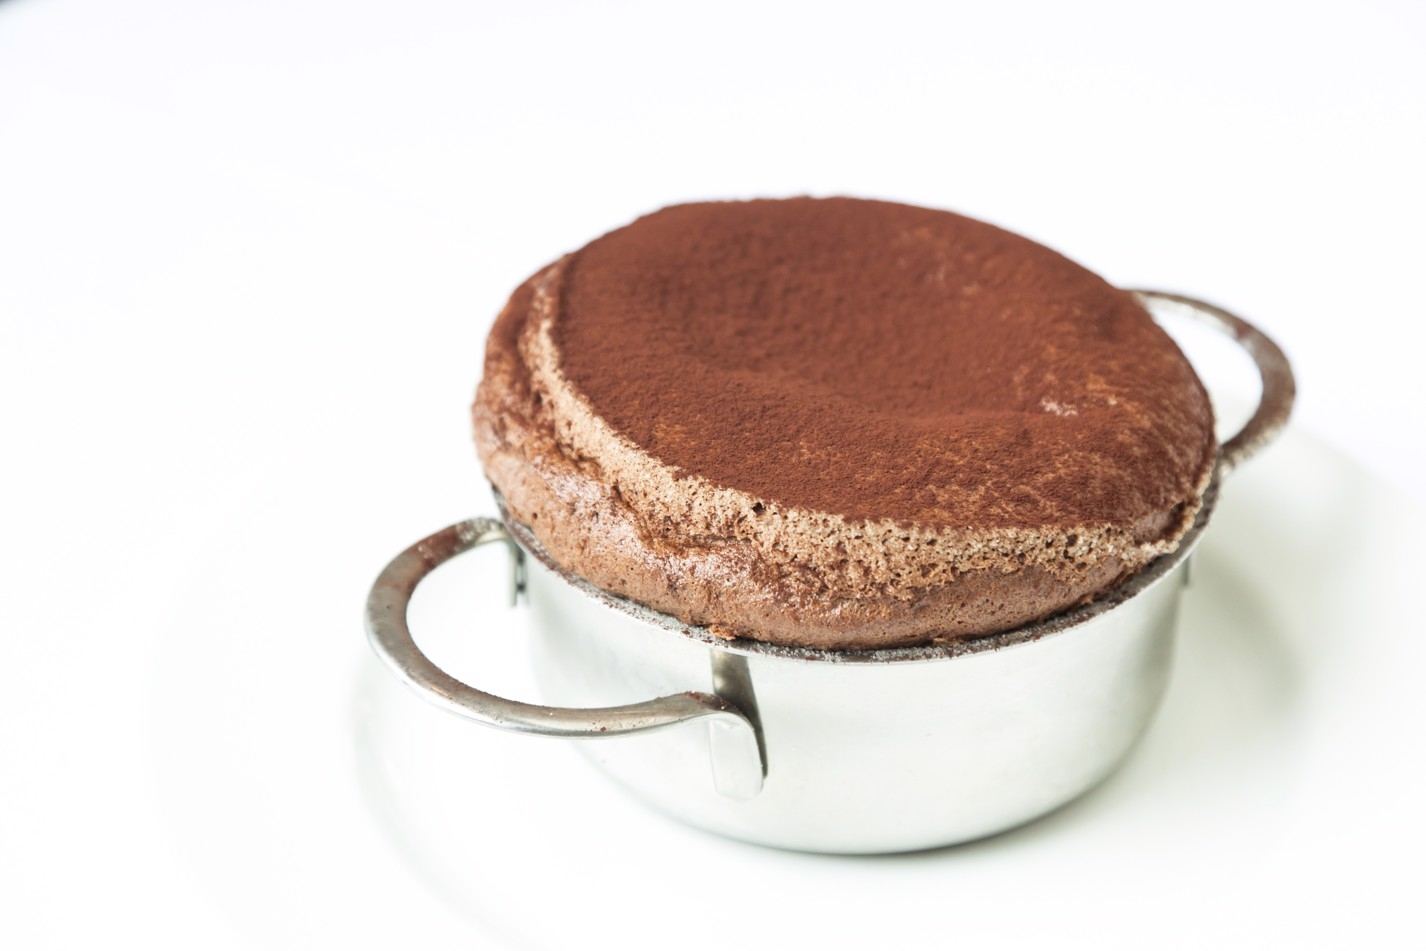 Hot chocolate soufflé